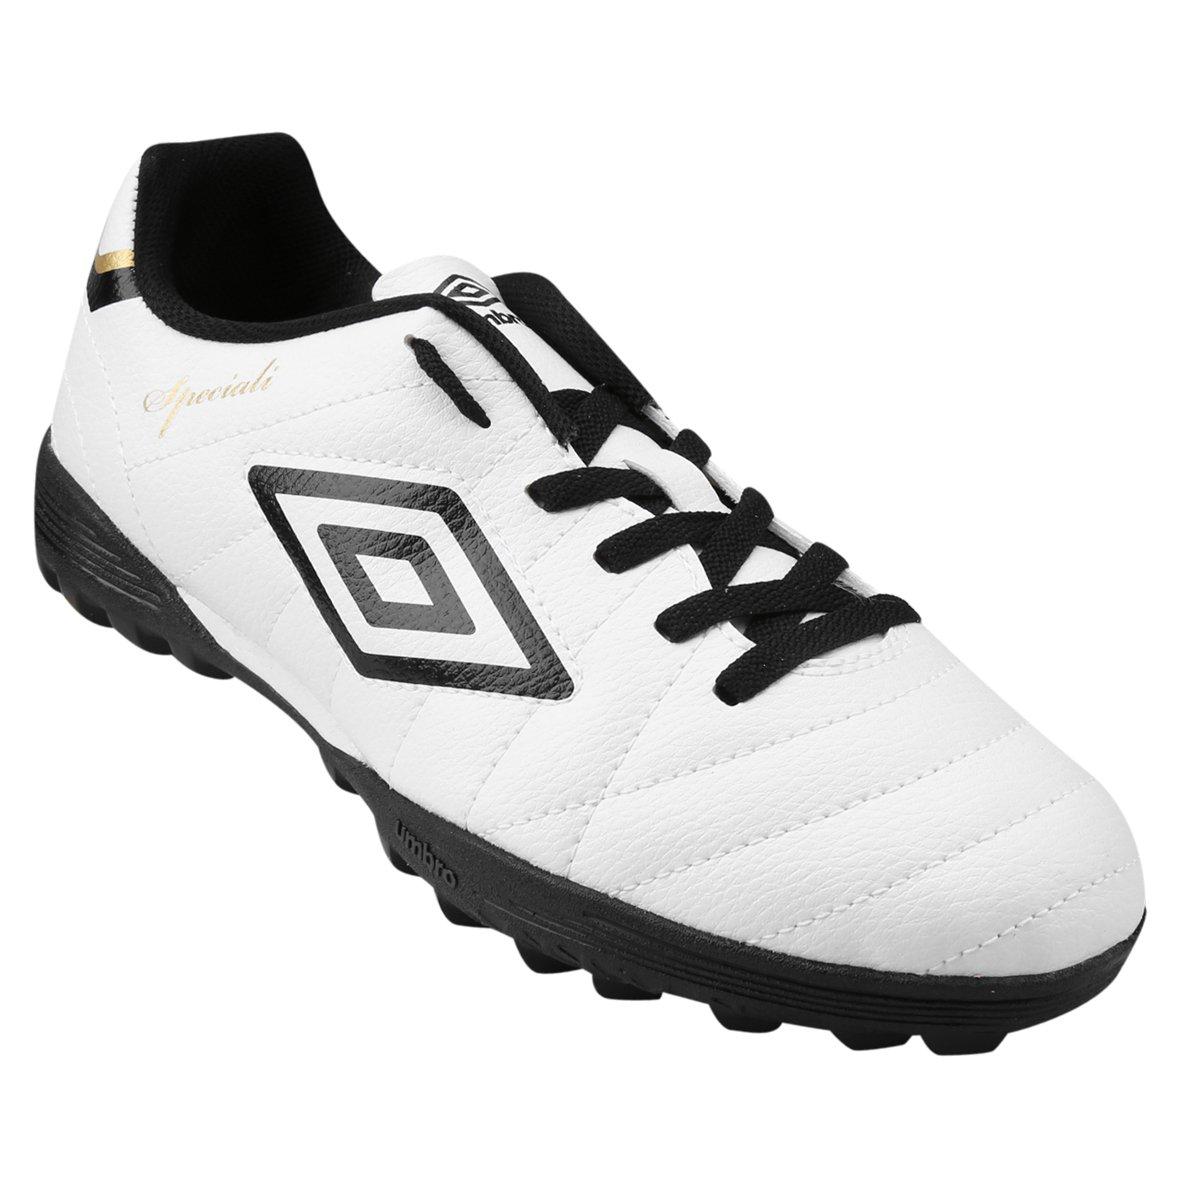 1cac93457789c Chuteira Society Umbro Speciali Club Masculina - Branco e Preto - Compre  Agora